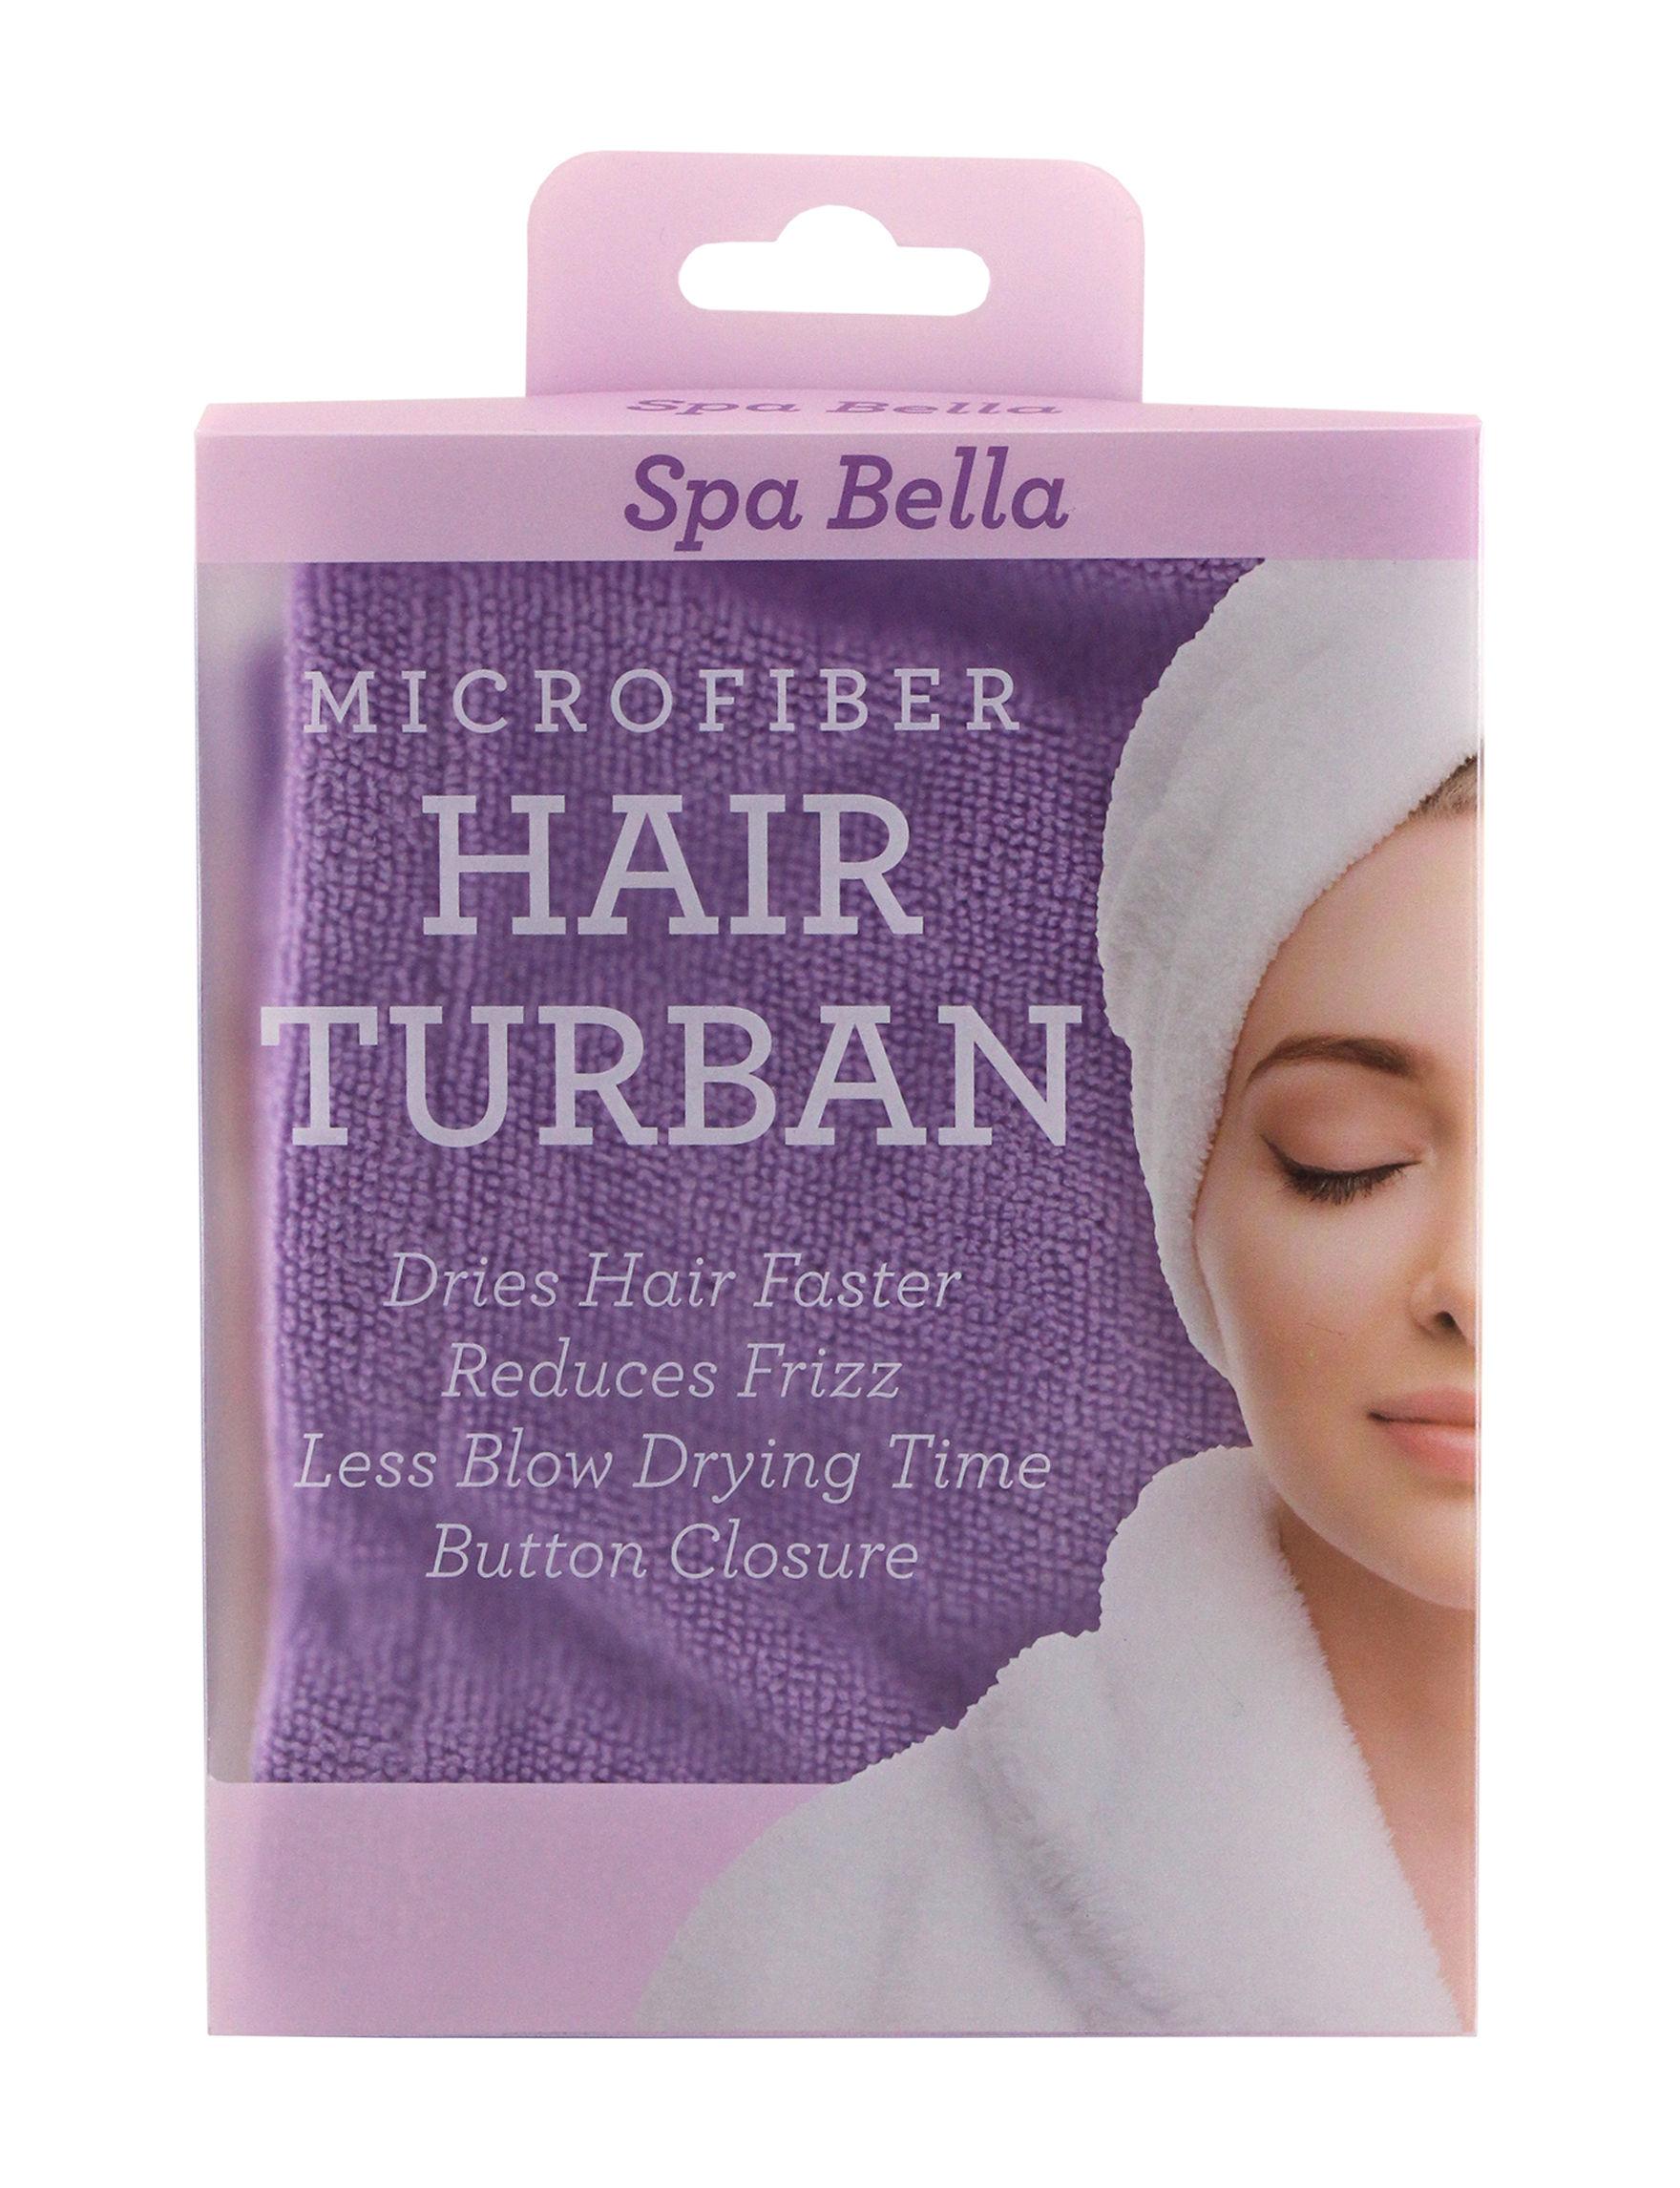 Spa Bella Purple Bath & Body Accessories Hairstyling Tools